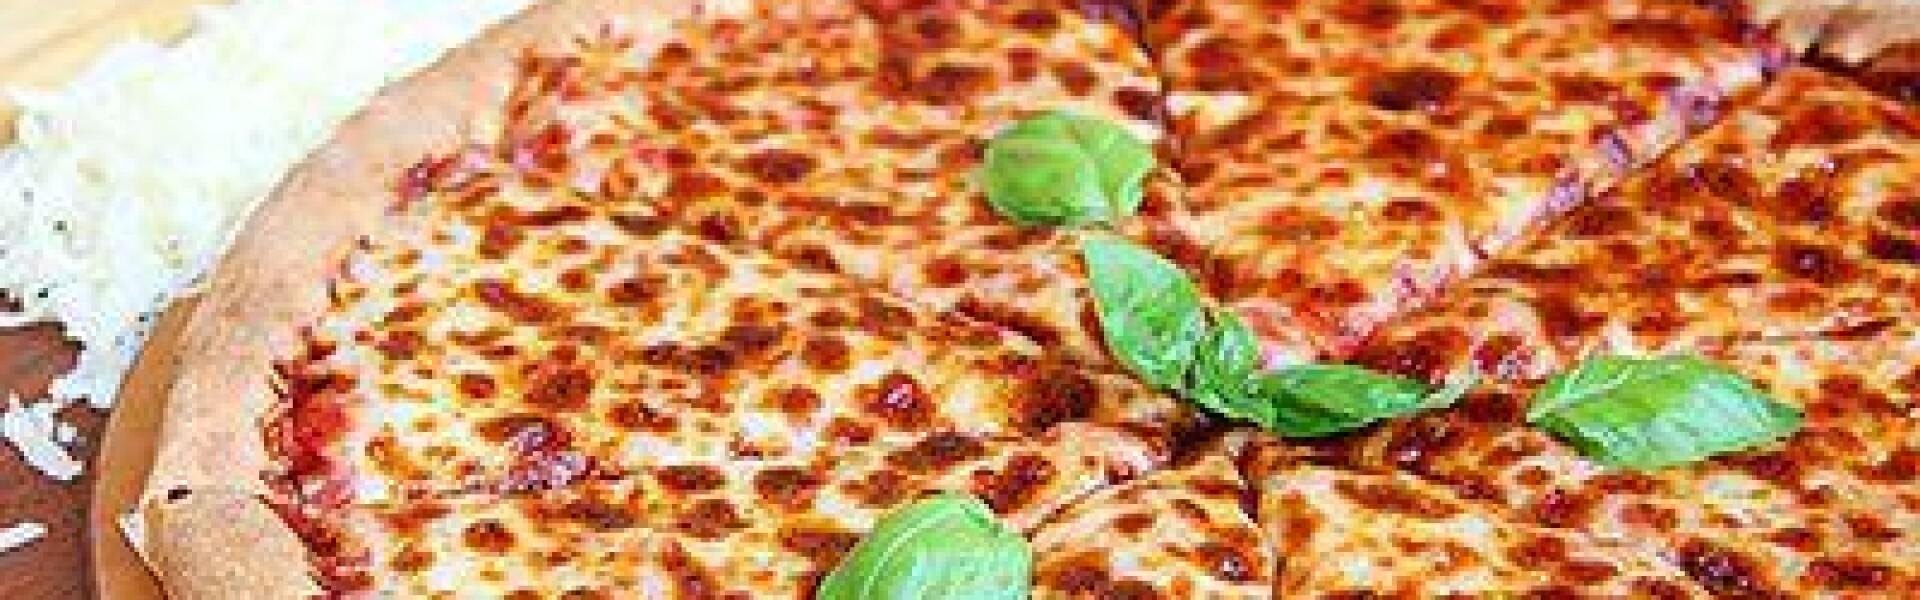 CoolWNS ·Итальянская кухня